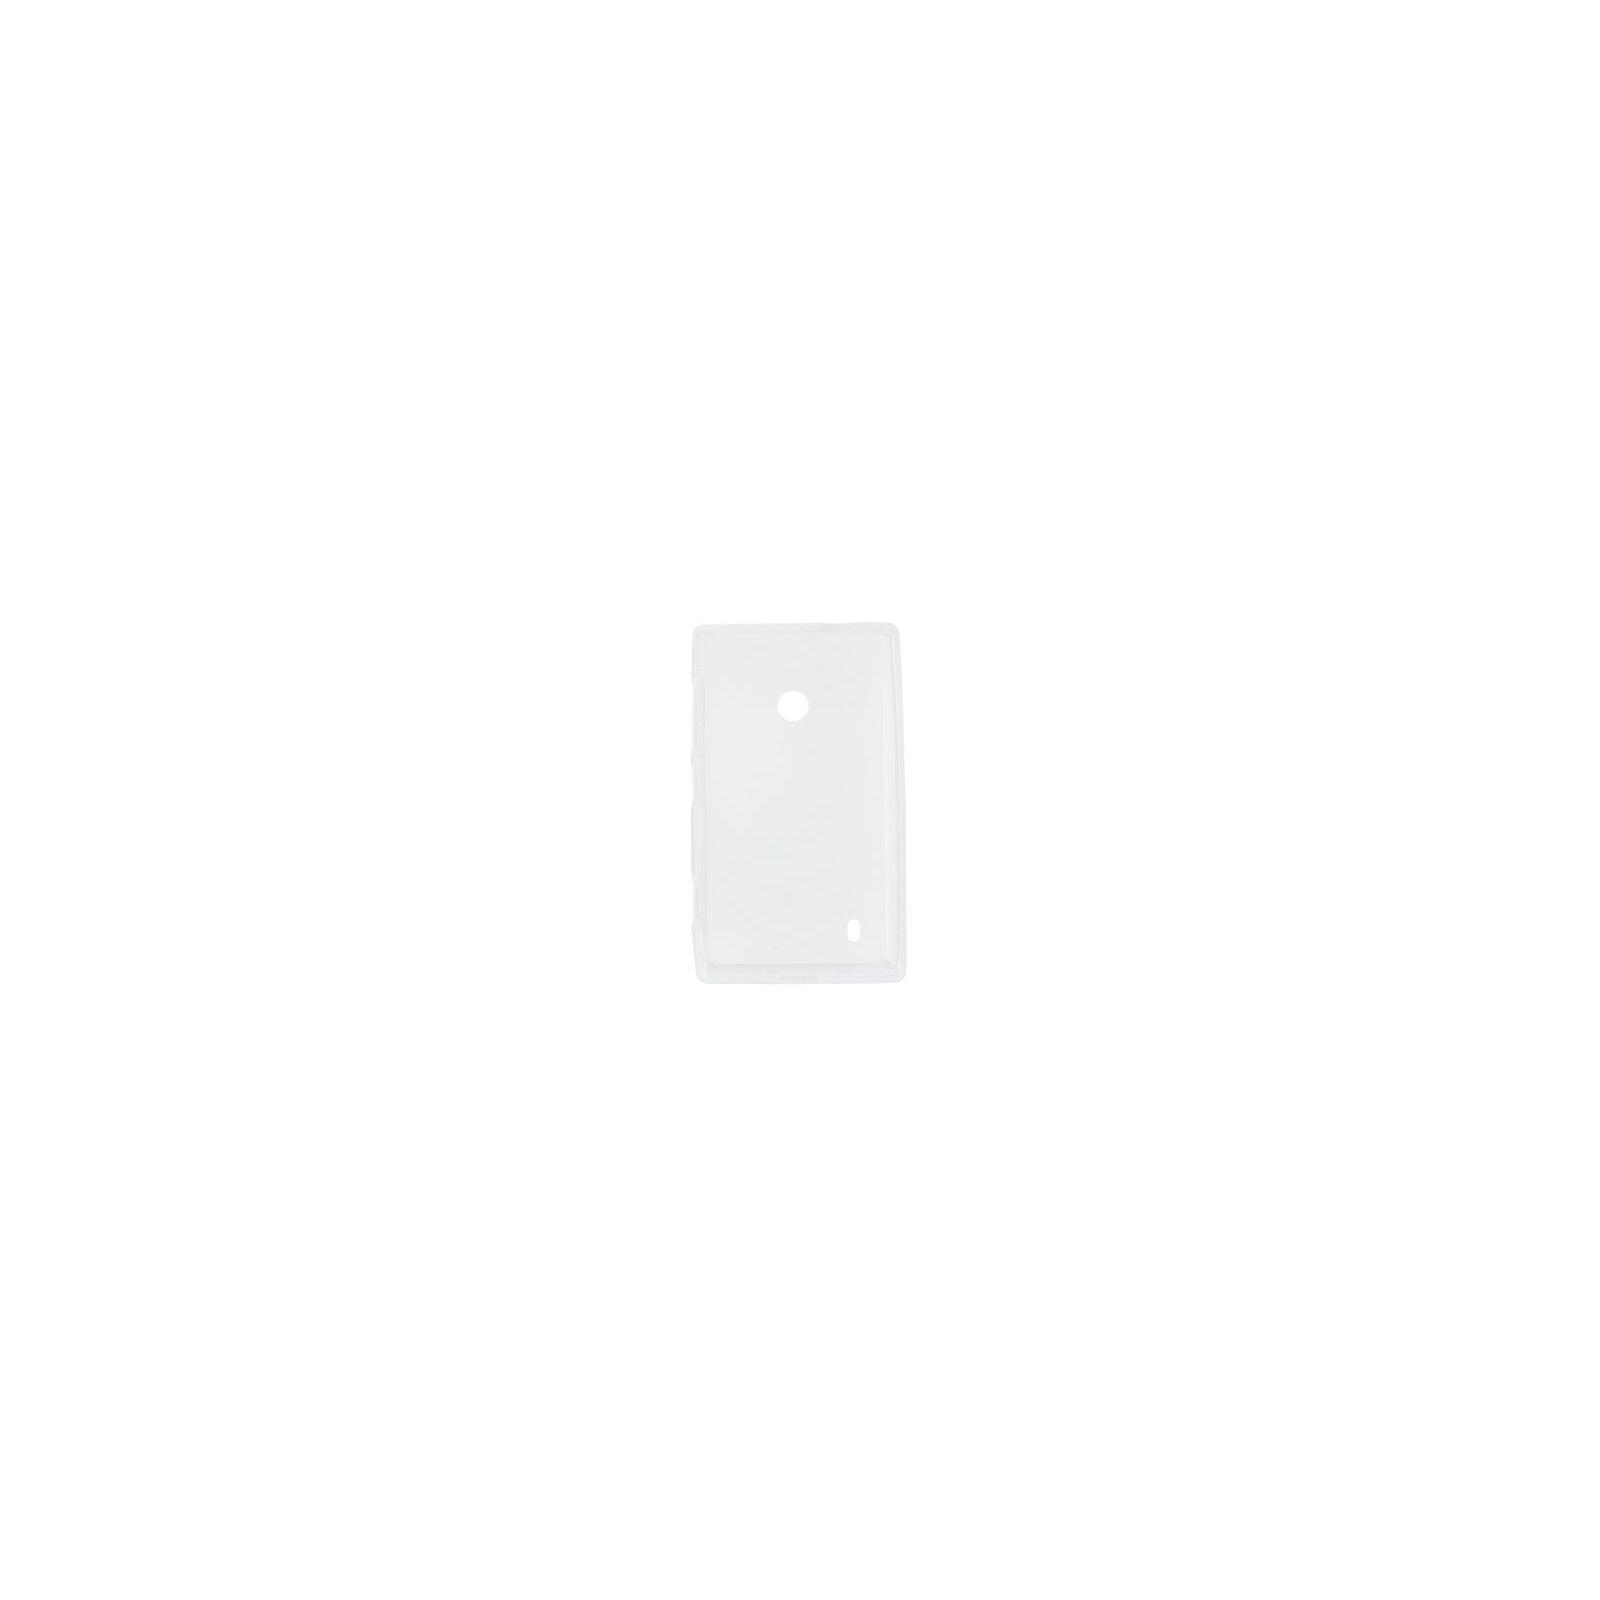 Чехол для моб. телефона для Nokia Lumia 525 (White Clear) Elastic PU Drobak (216397)